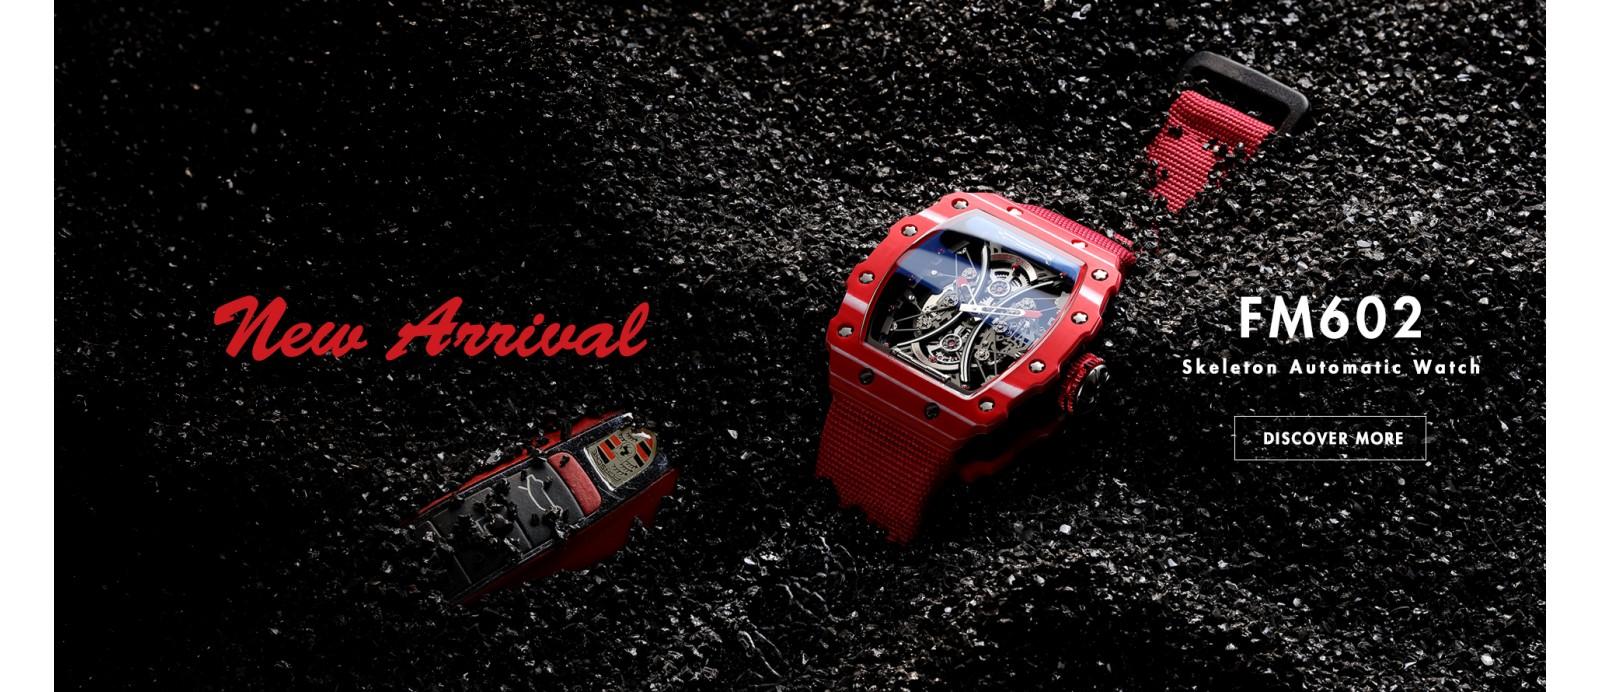 fm602-skeleton-automatic-watch